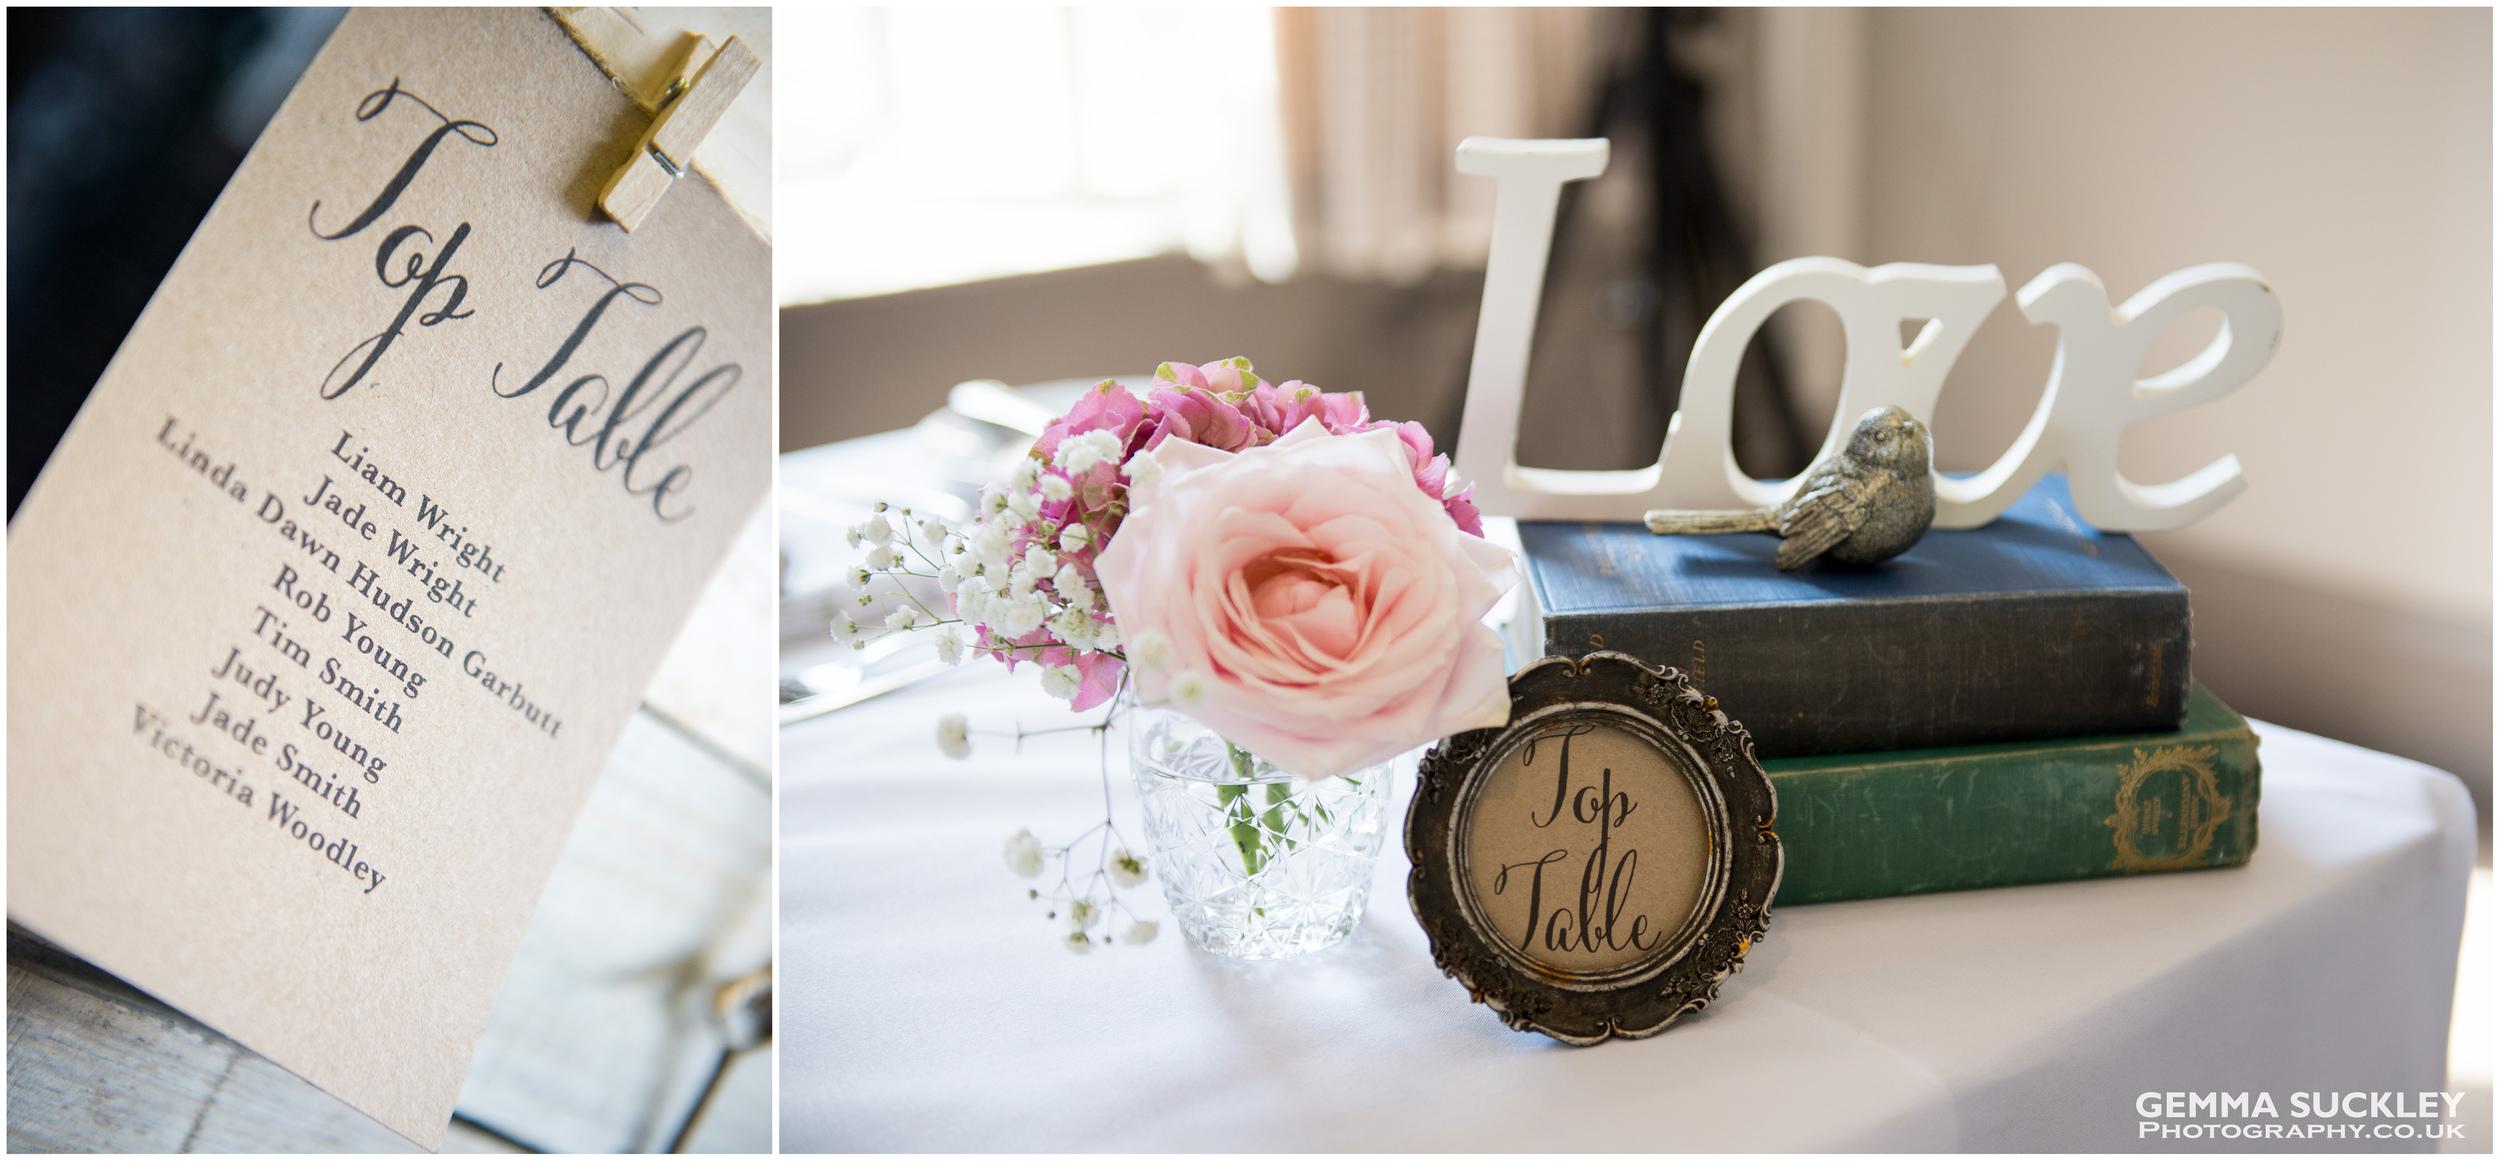 weddings-at-the-whiye-hart-harrogate.jpg